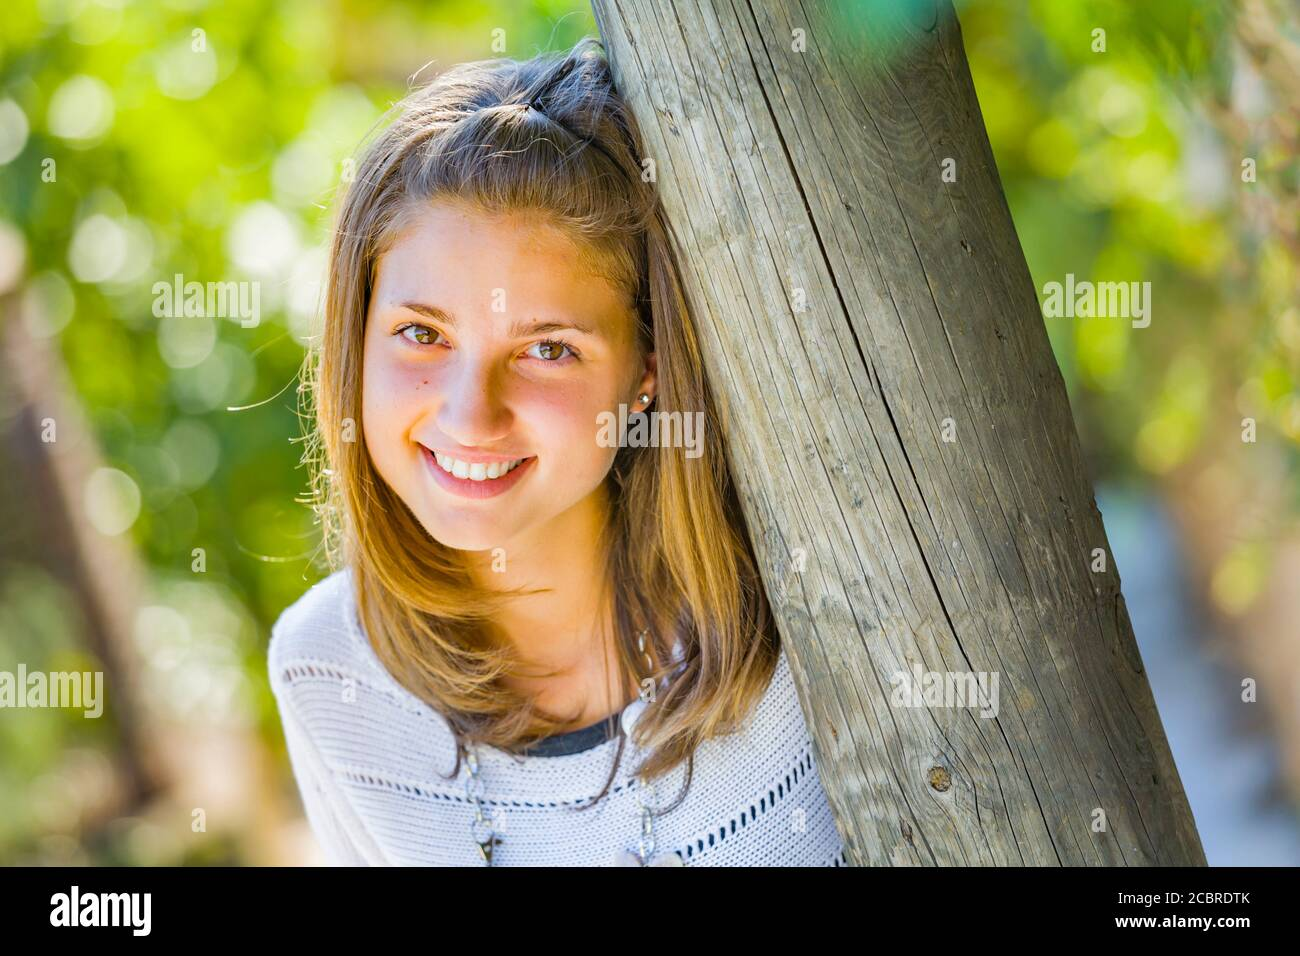 Teengirl portrait smiling at camera eyeshot Stock Photo